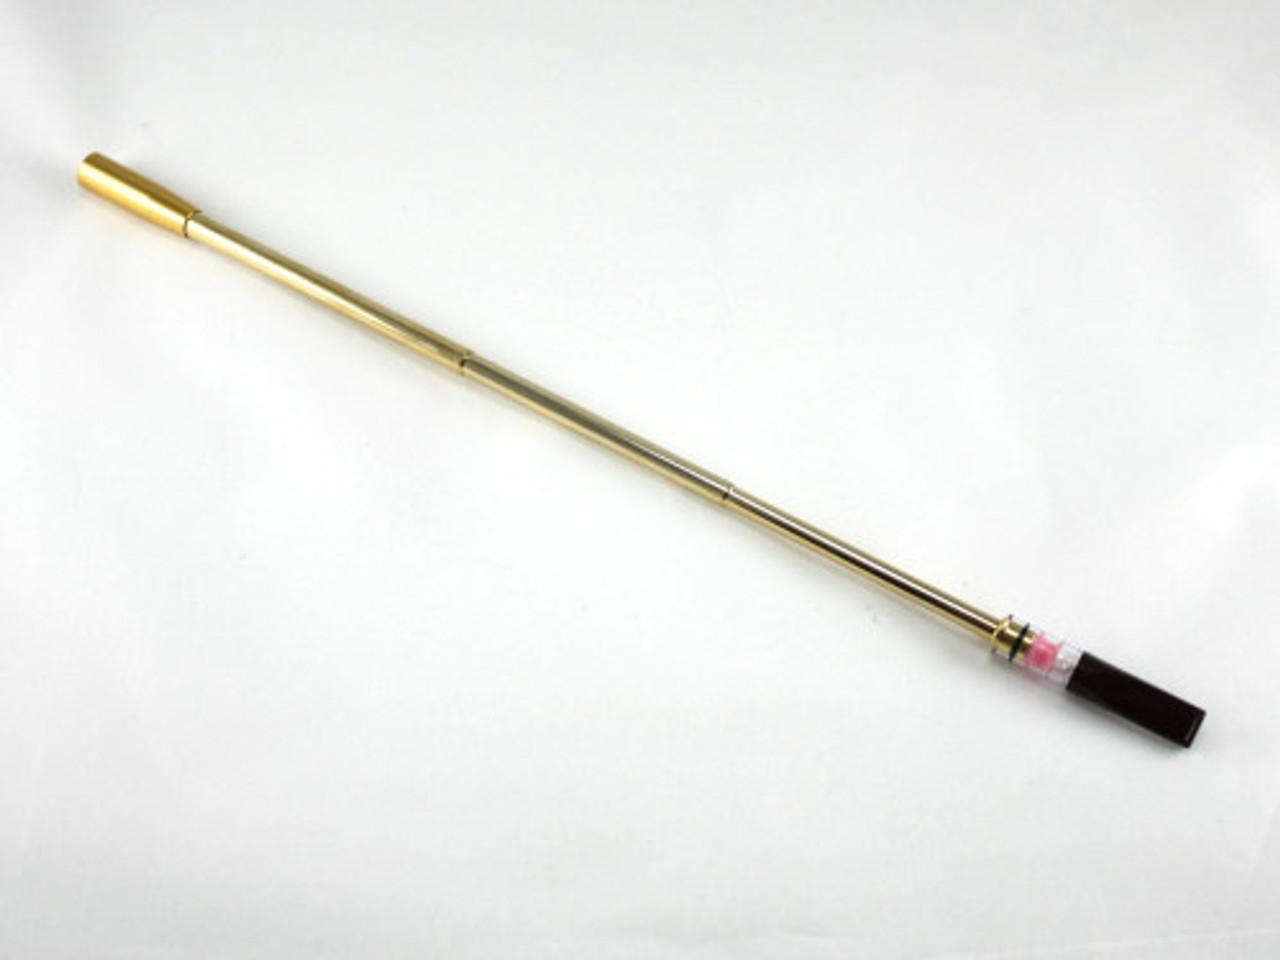 Classic Telescopic Filtered Cigarette Holder